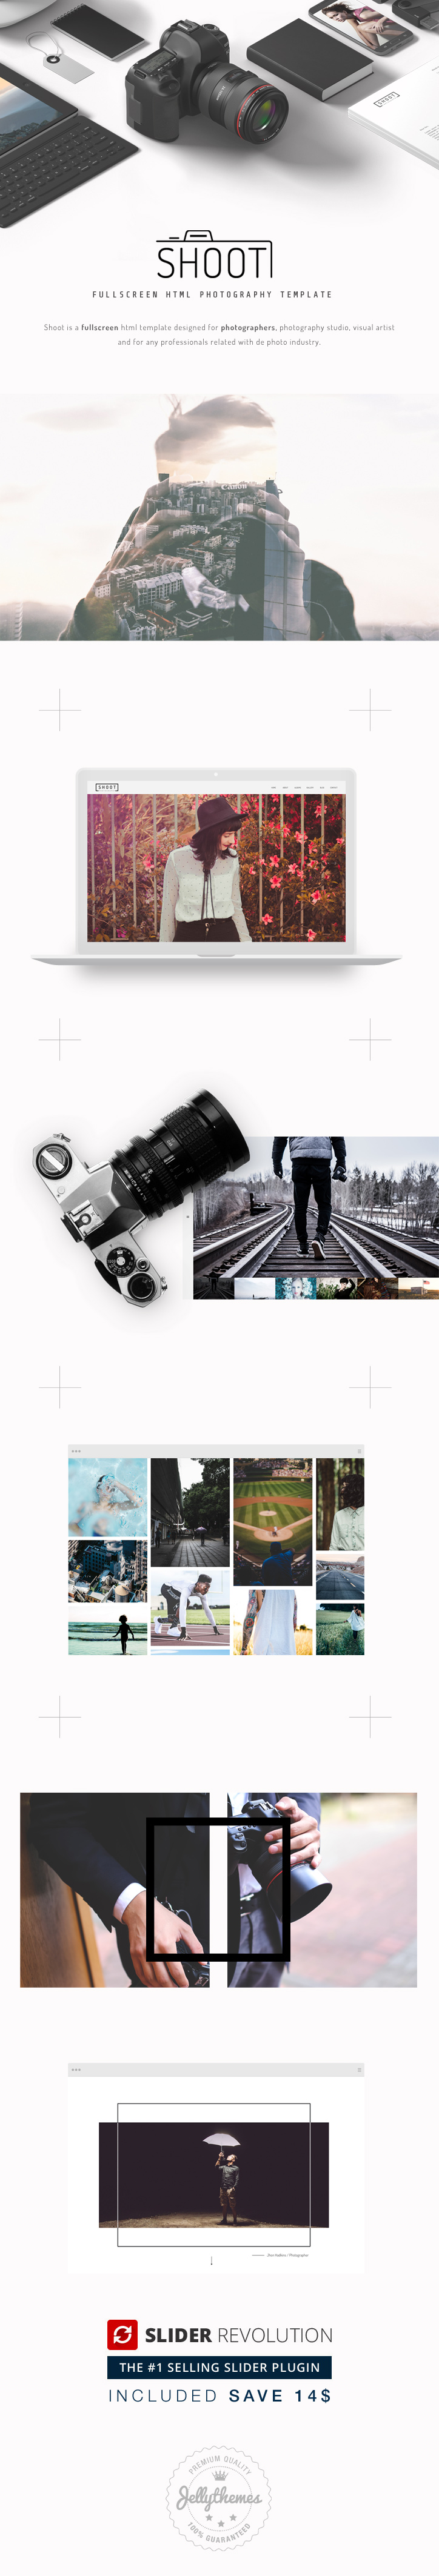 Shoot - Fullscreen Photography HTML Template - 1